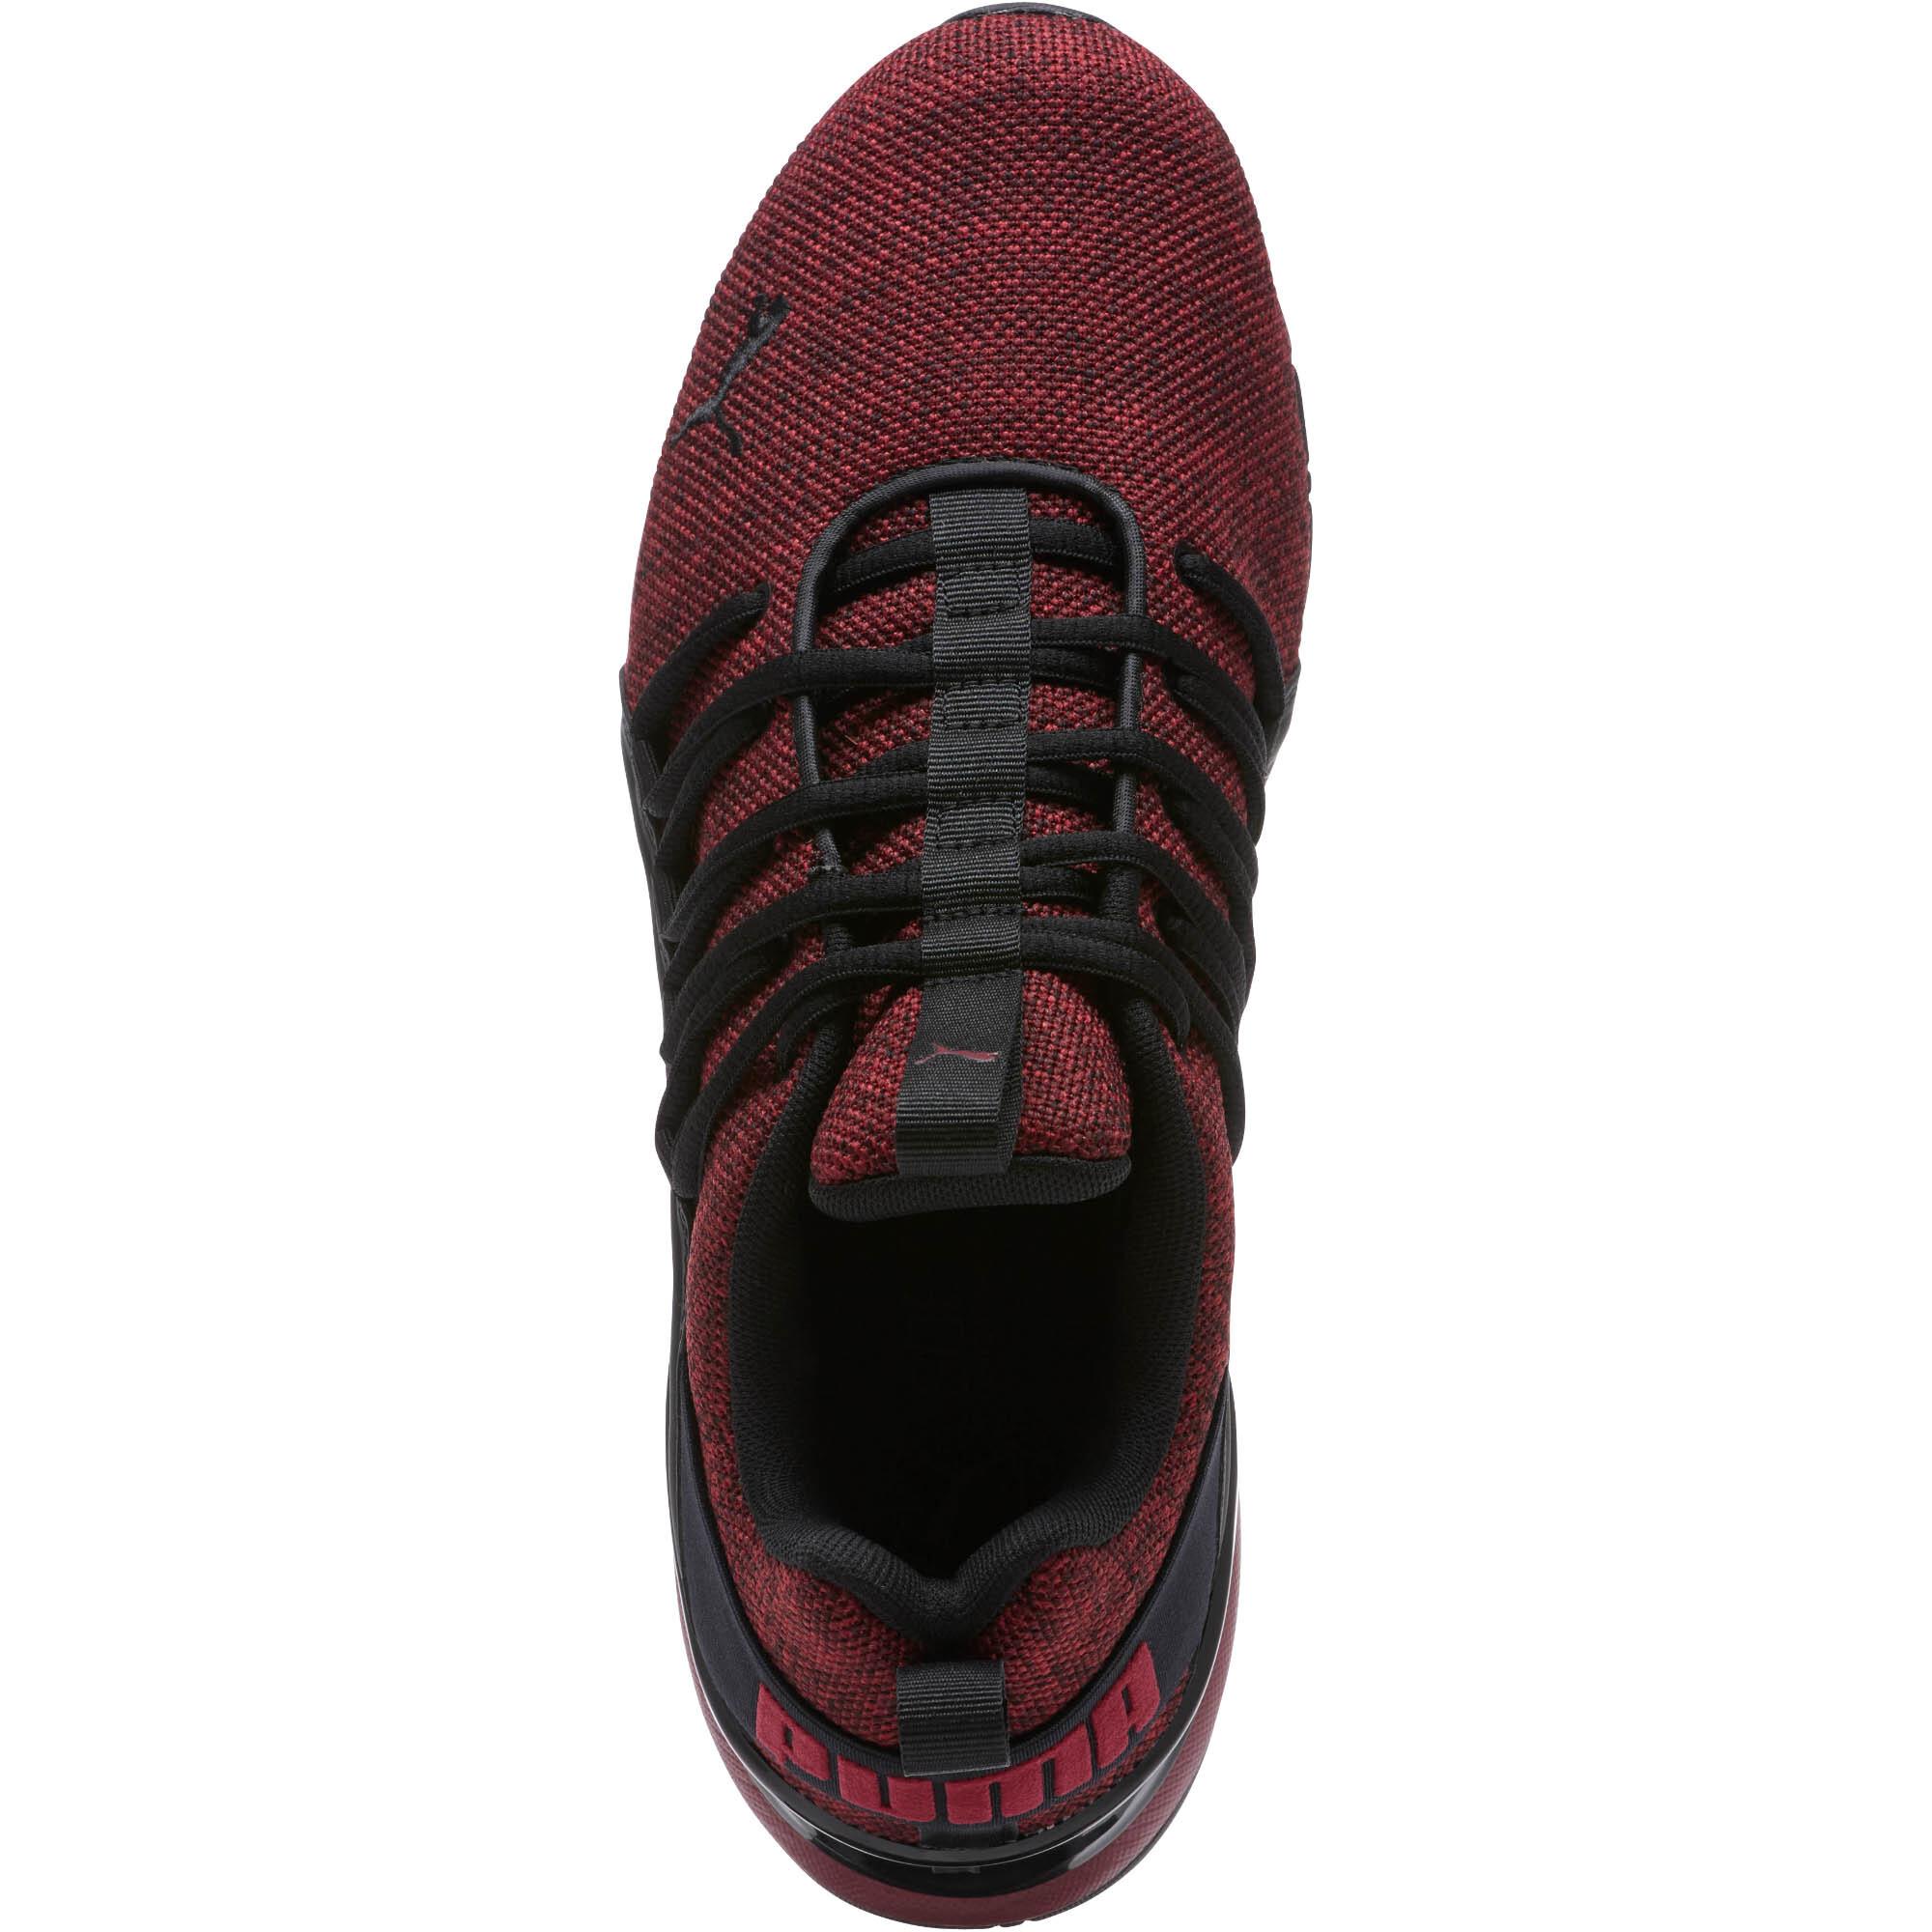 PUMA-Axelion-Men-039-s-Training-Shoes-Men-Shoe-Running thumbnail 31